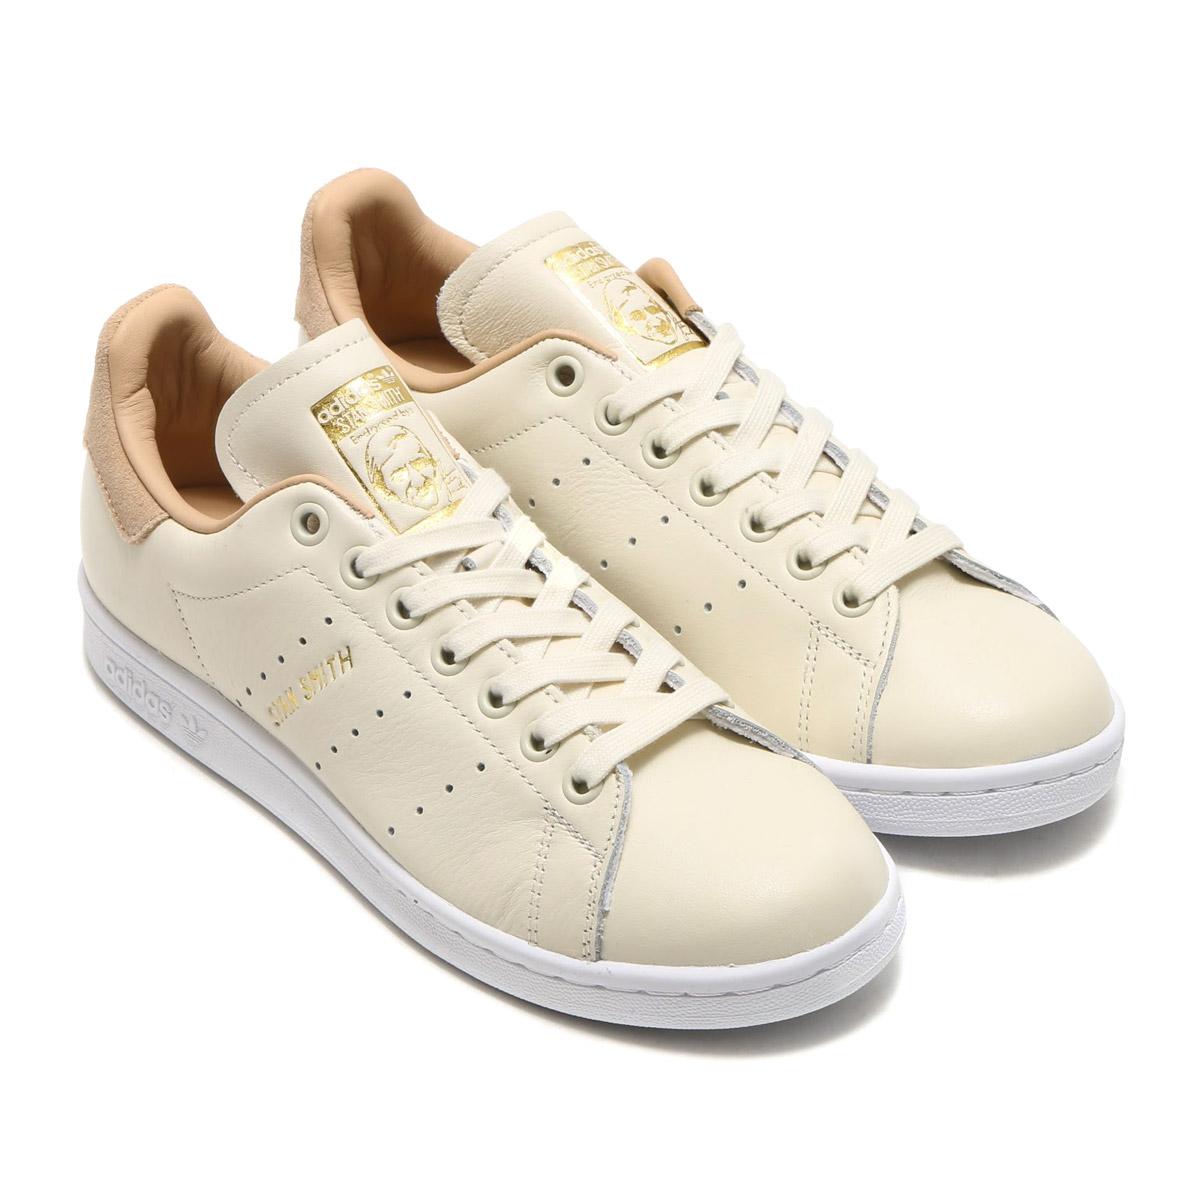 9aa7a425ad9 ... discount adidas originals stan smith w adidas originals stan smith w off  white off white veil